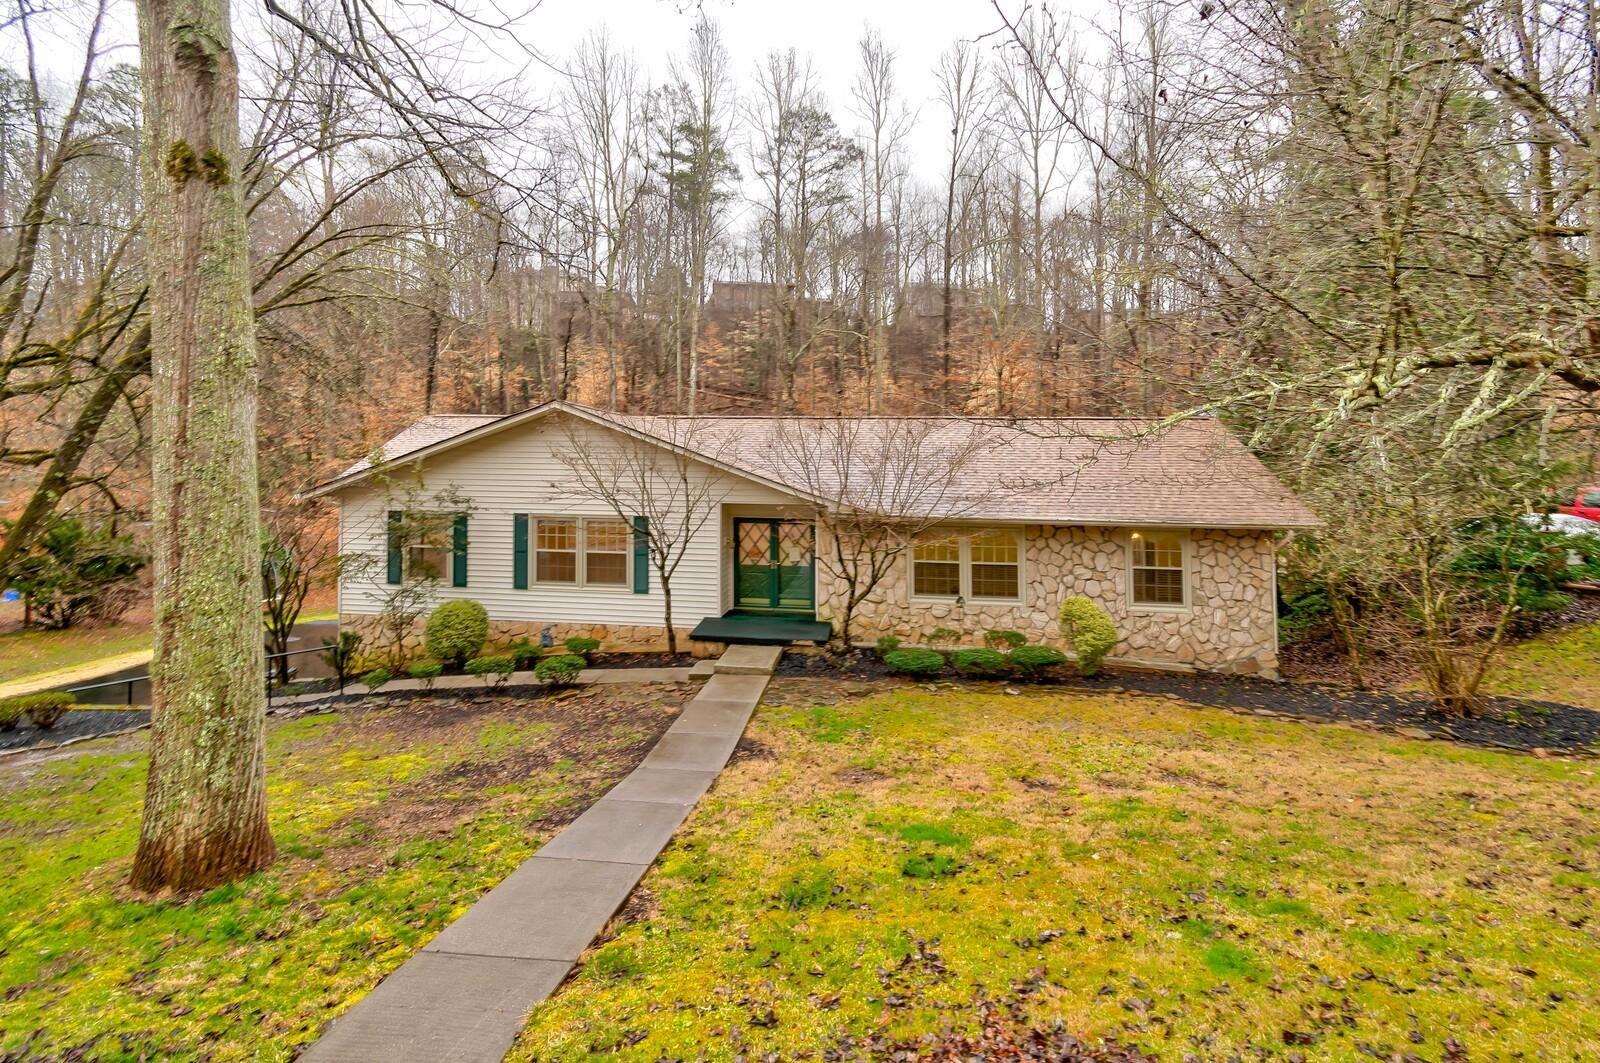 Photo of 233 Gum Hollow Rd, Oak Ridge, TN 37830 (MLS # 1142821)